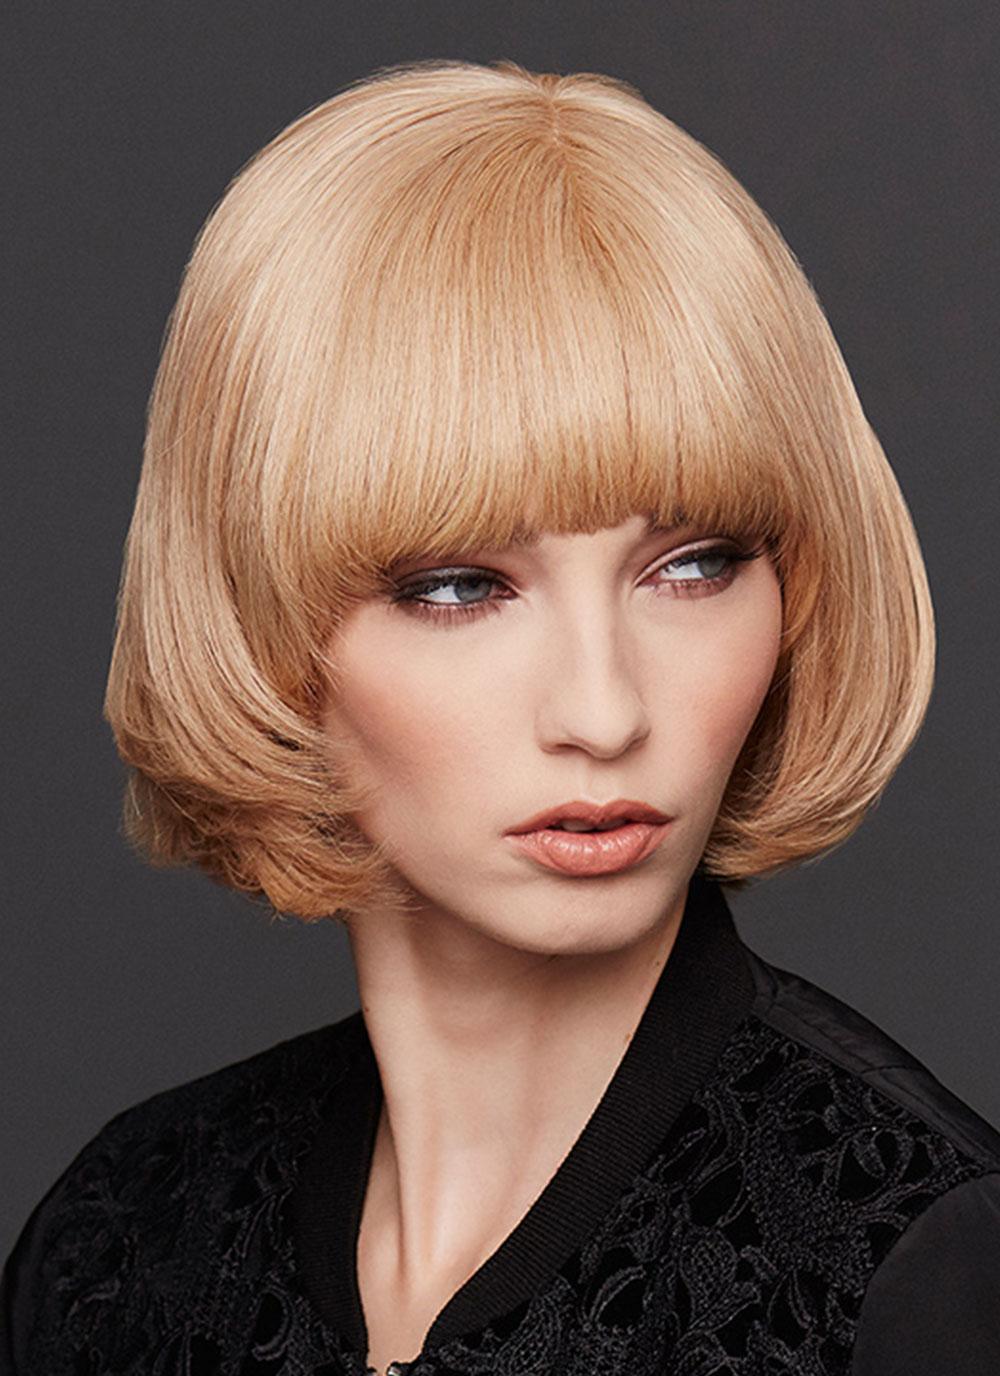 peruca par natural, peruca page echthaar, peruci cluj, peruci timisoara, peruca gisela mayer